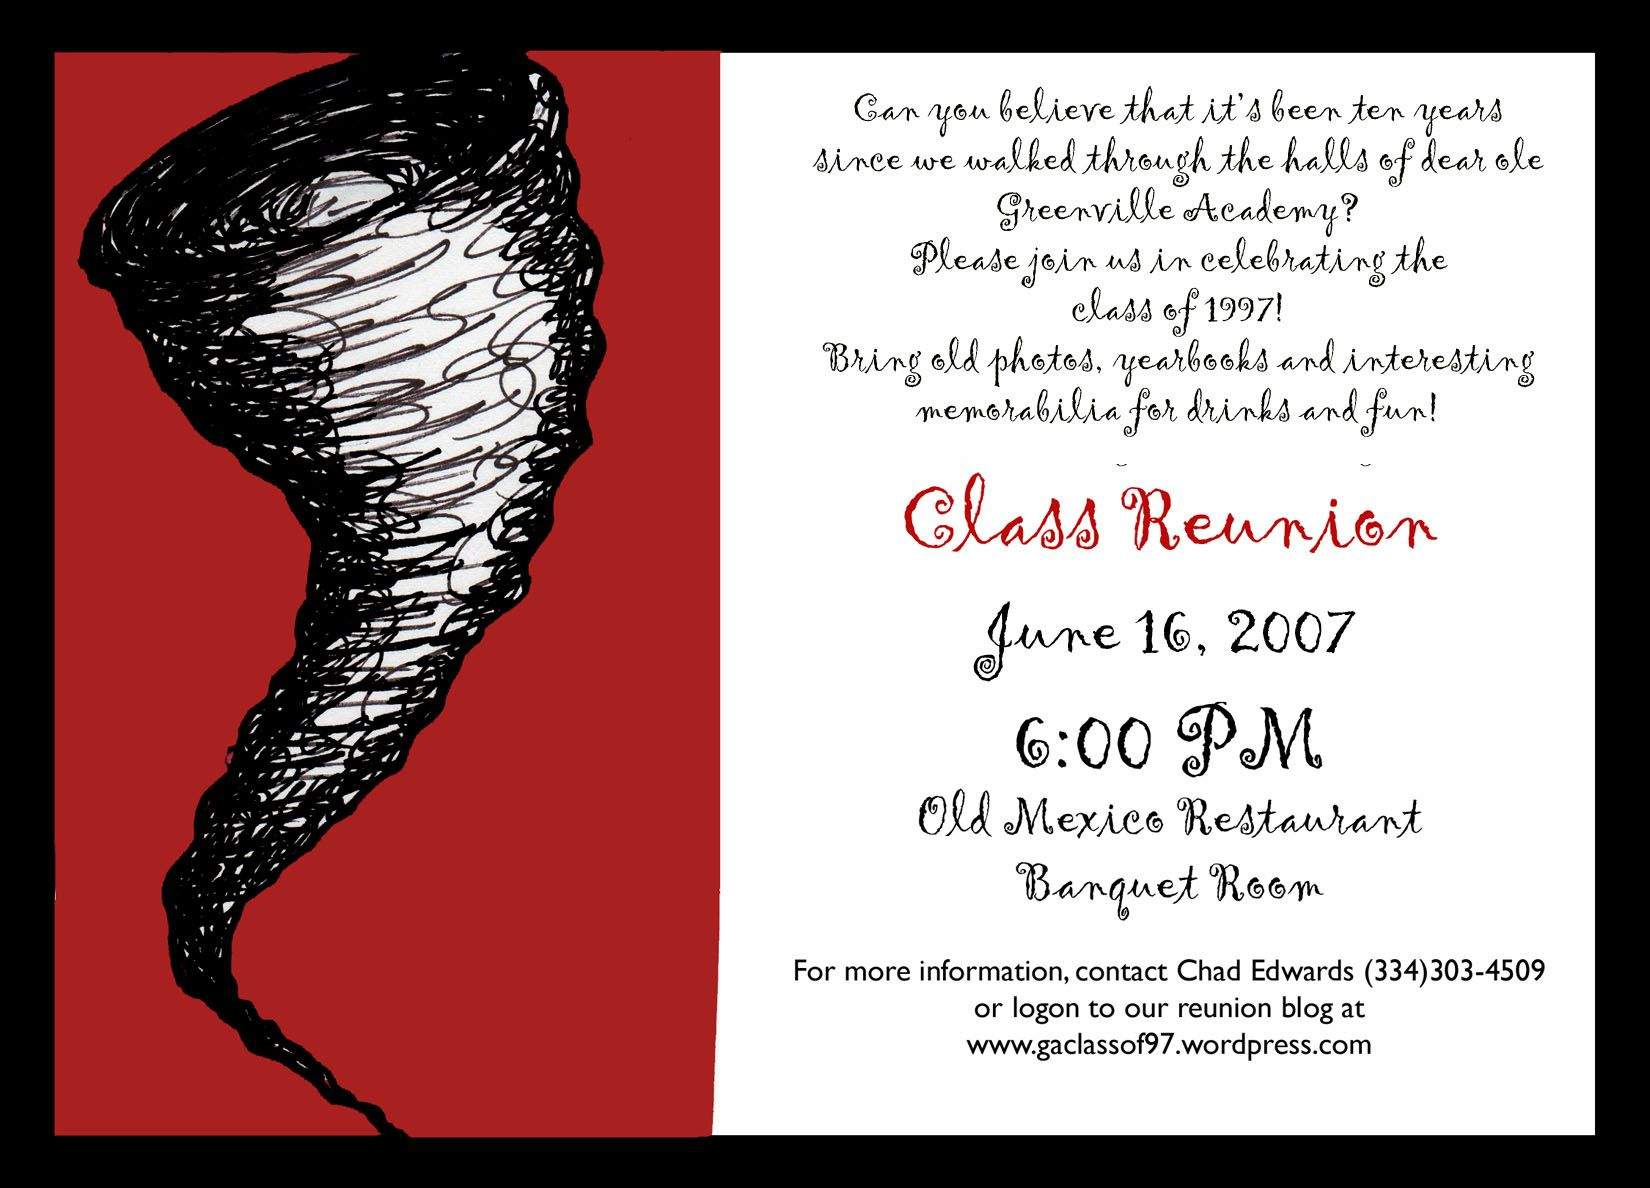 10 Year Reunion Invitation Reunion Invitations Class Reunion Class Reunion Invitations